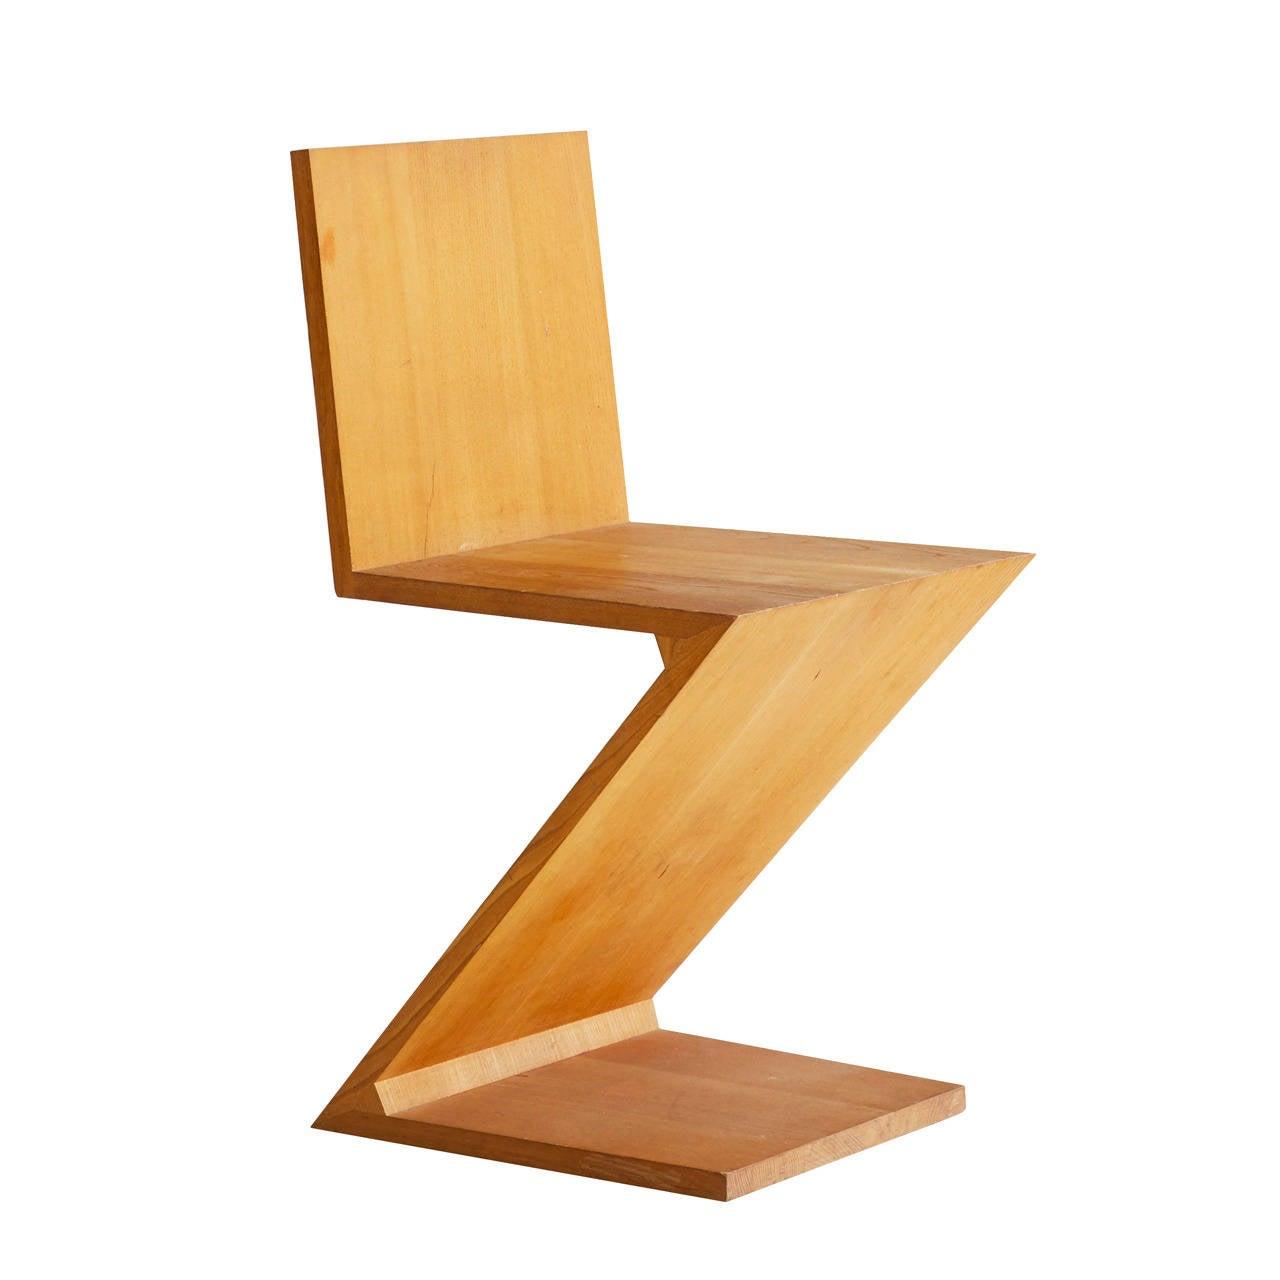 Gerrit Rietveld Zig Zag Chair At 1stdibs